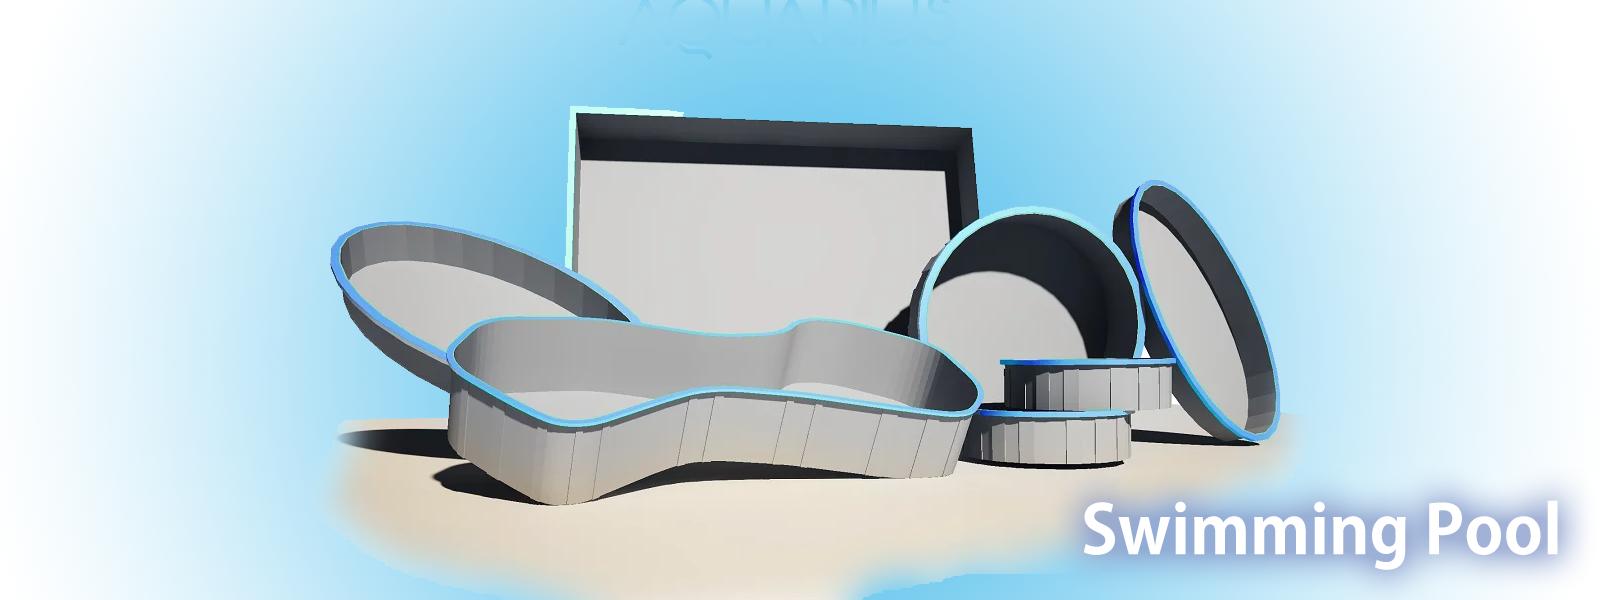 swimming-pool-slider1